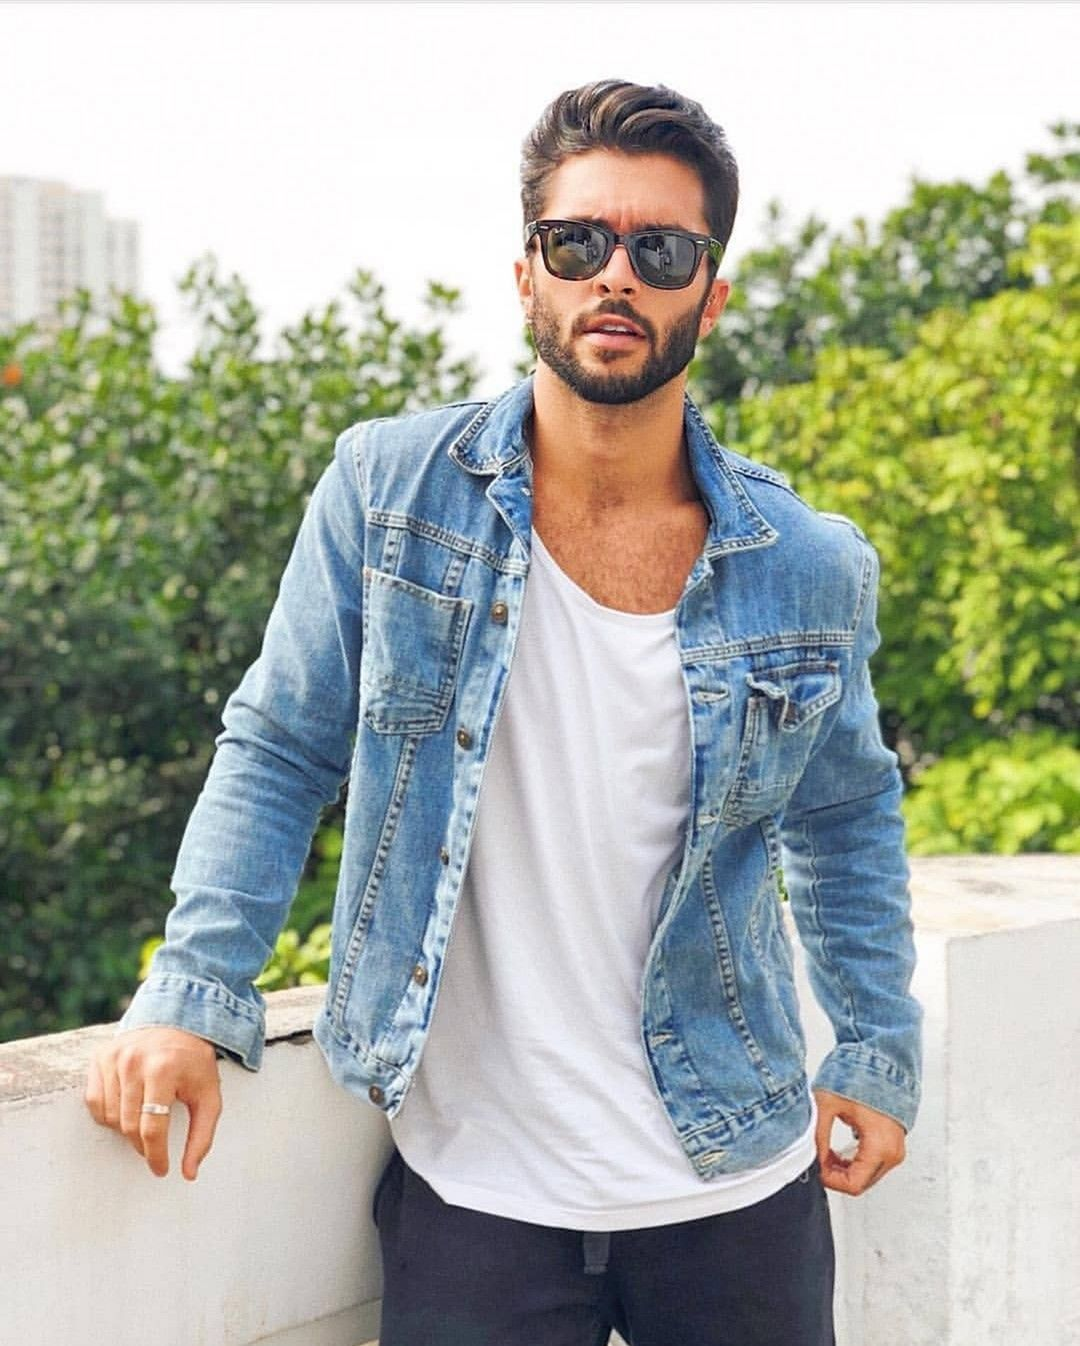 45 Awesome Jeans Jackets Ideas For Men Look Cooler Fashions Nowadays Denim Jacket Outfit Denim Shirt Men Denim Jacket Men [ 1346 x 1080 Pixel ]